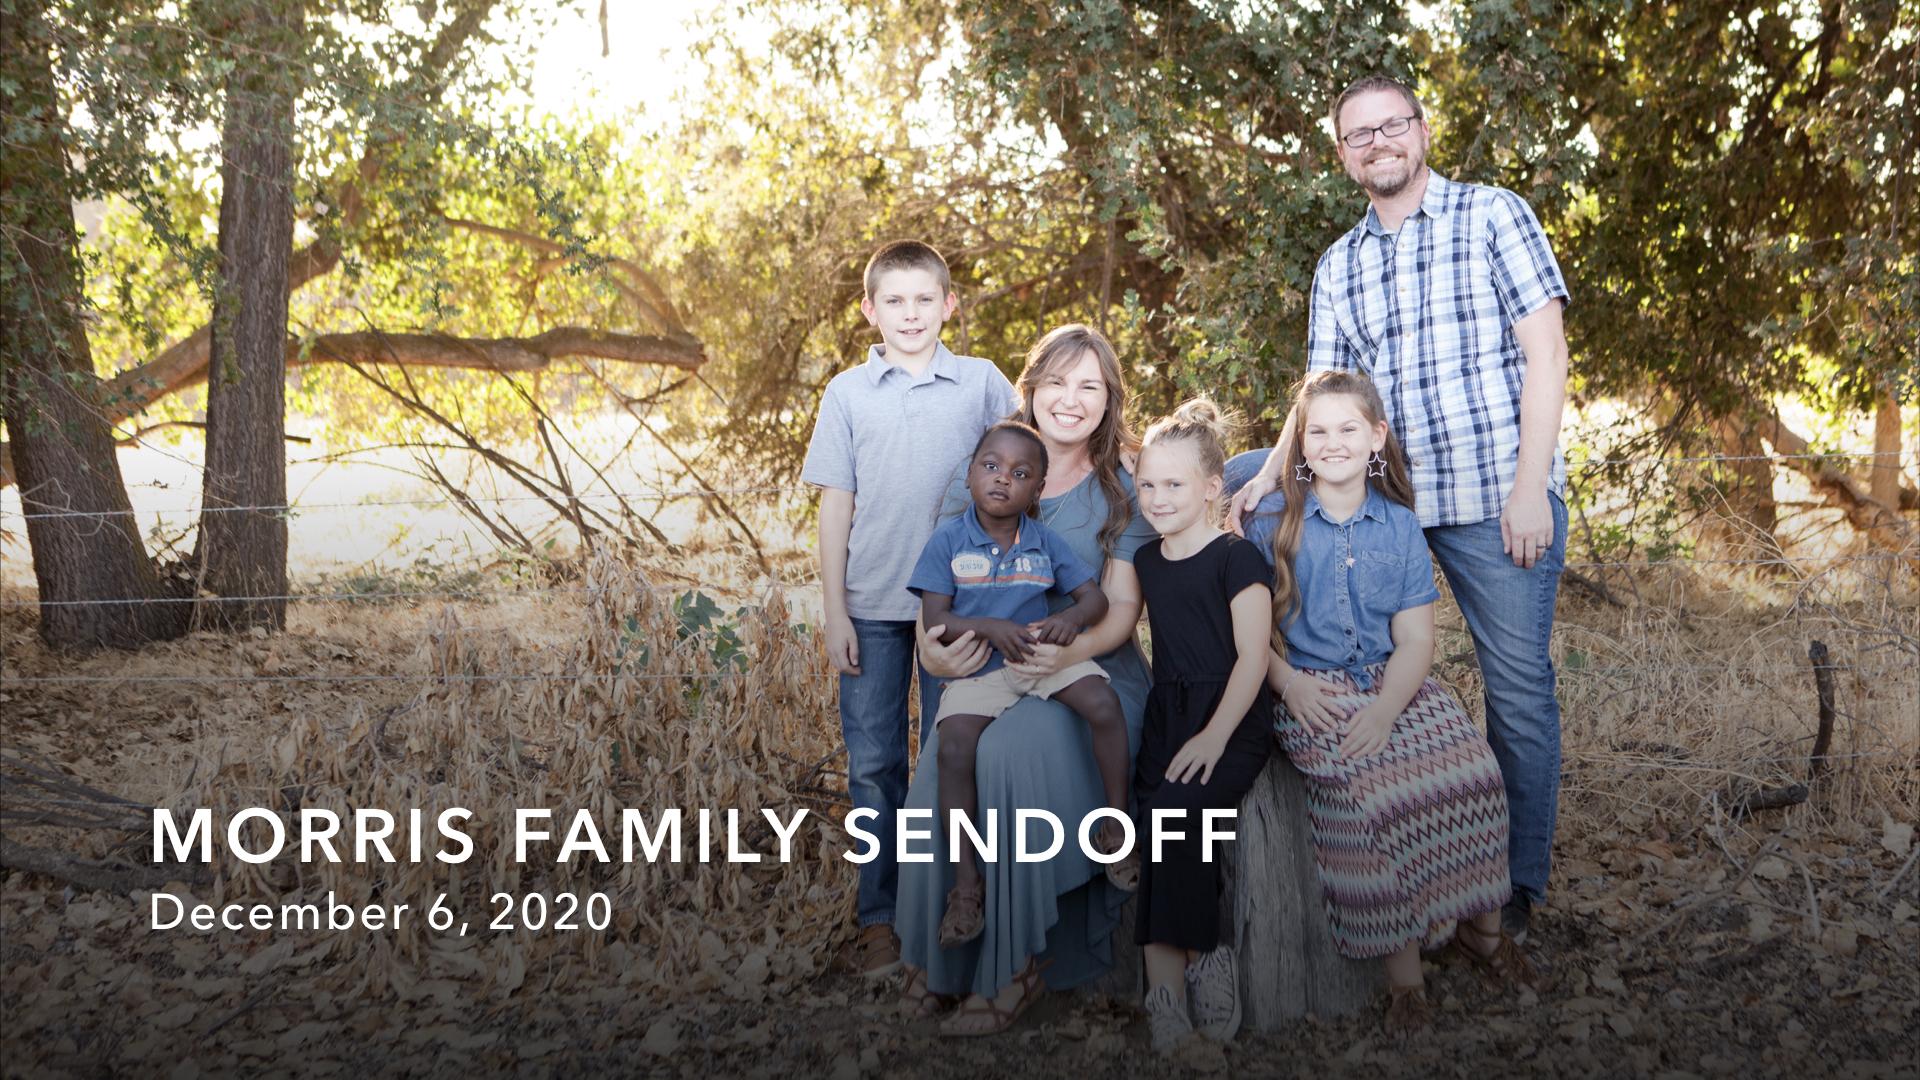 201206 Morris Family Sendoff.001